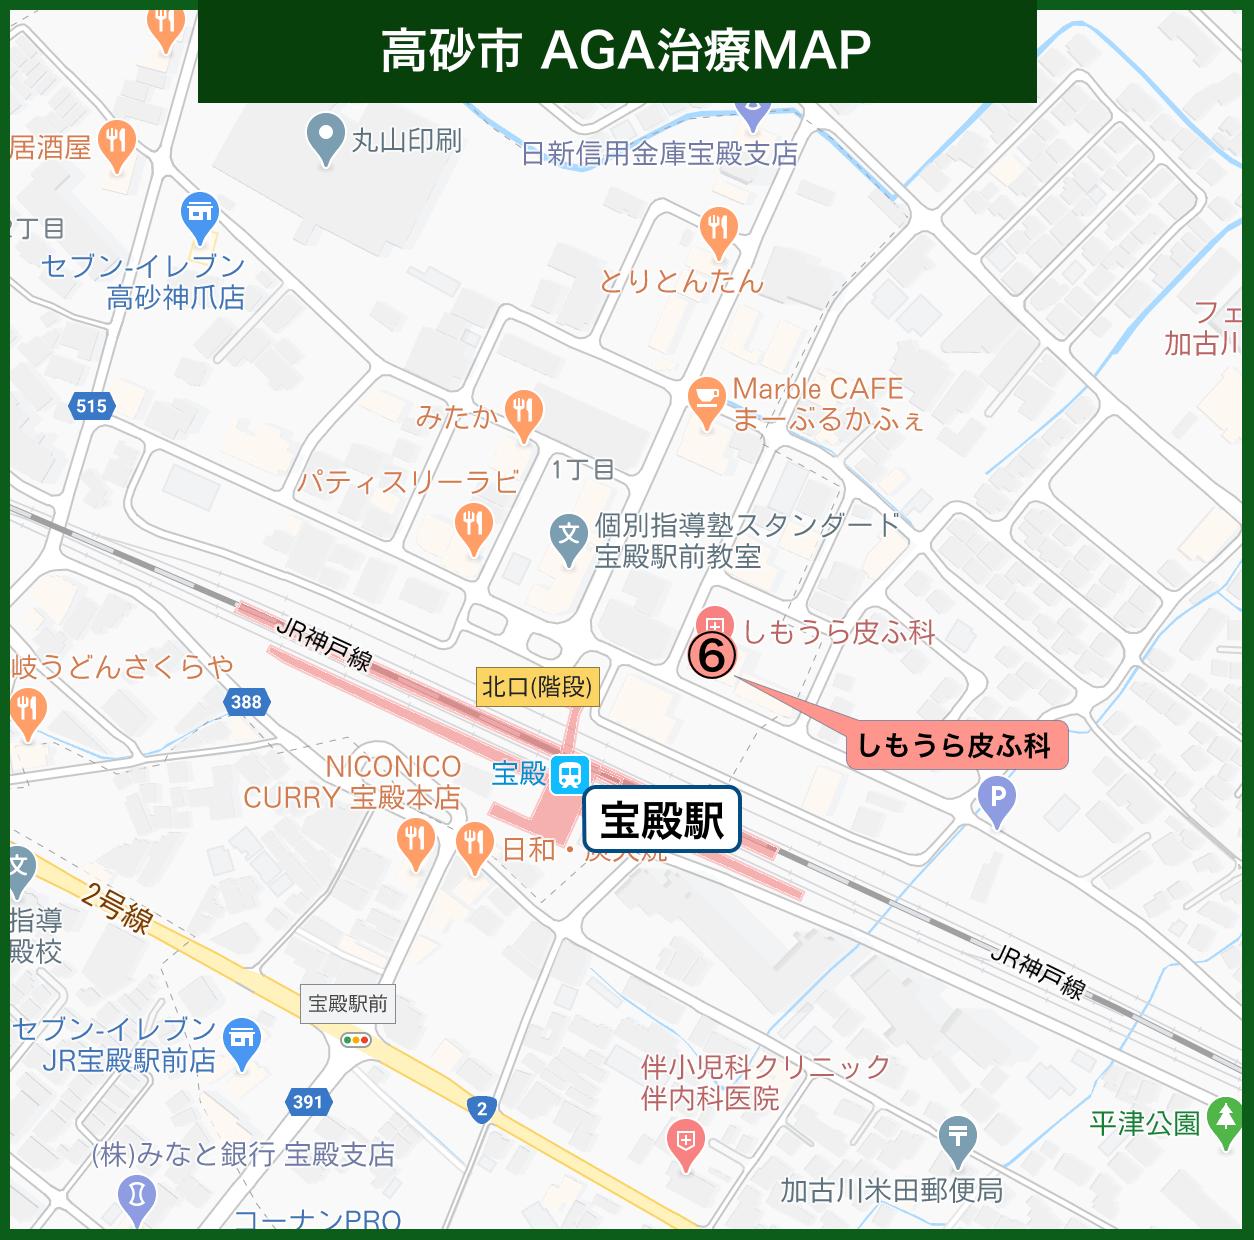 高砂市 AGA治療MAP